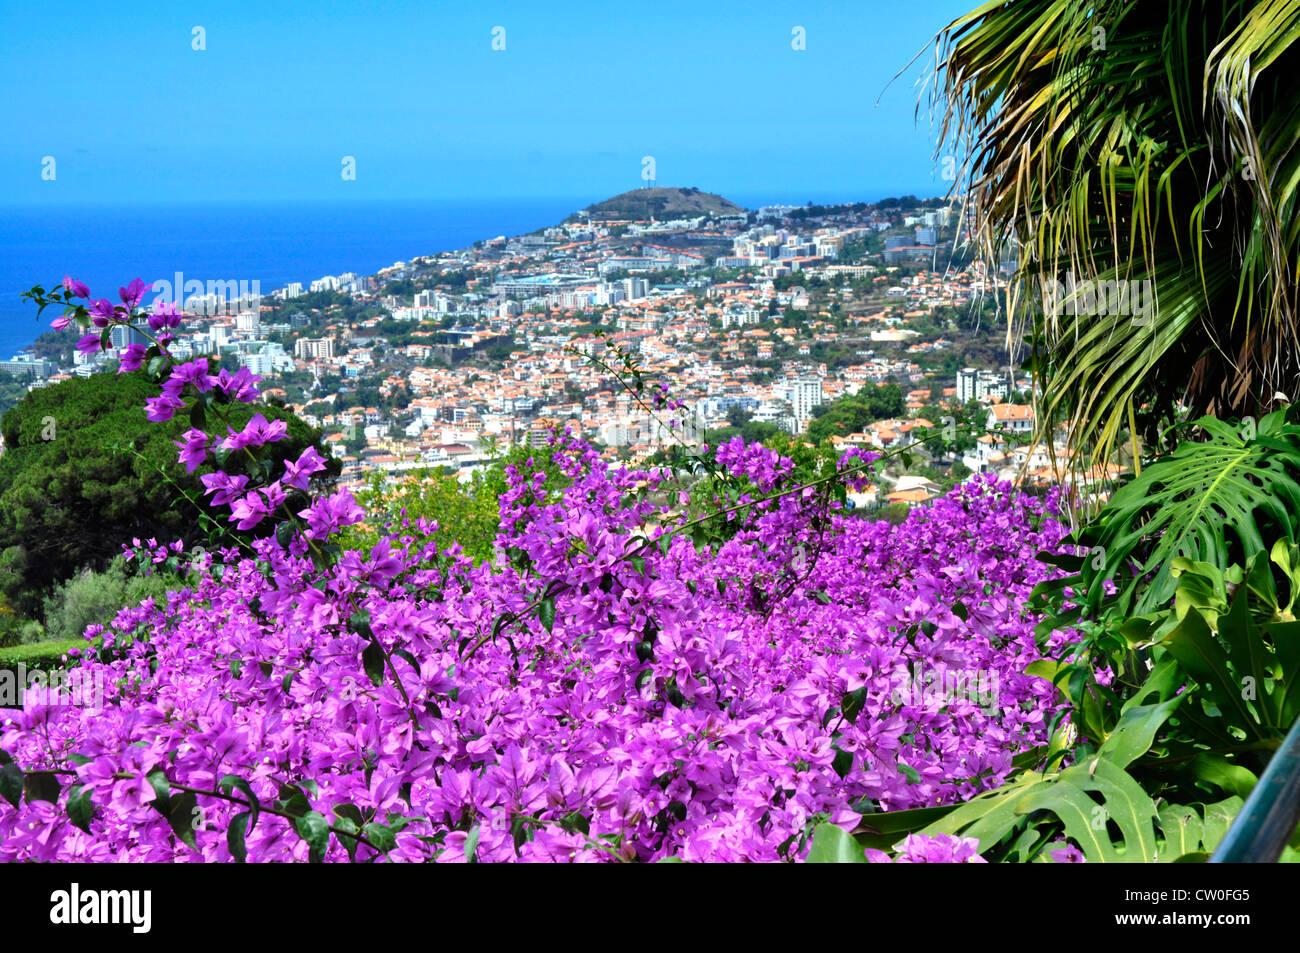 Portugal - Madeira - Funchal - ladera encima Gdns Botánico - vistas ...